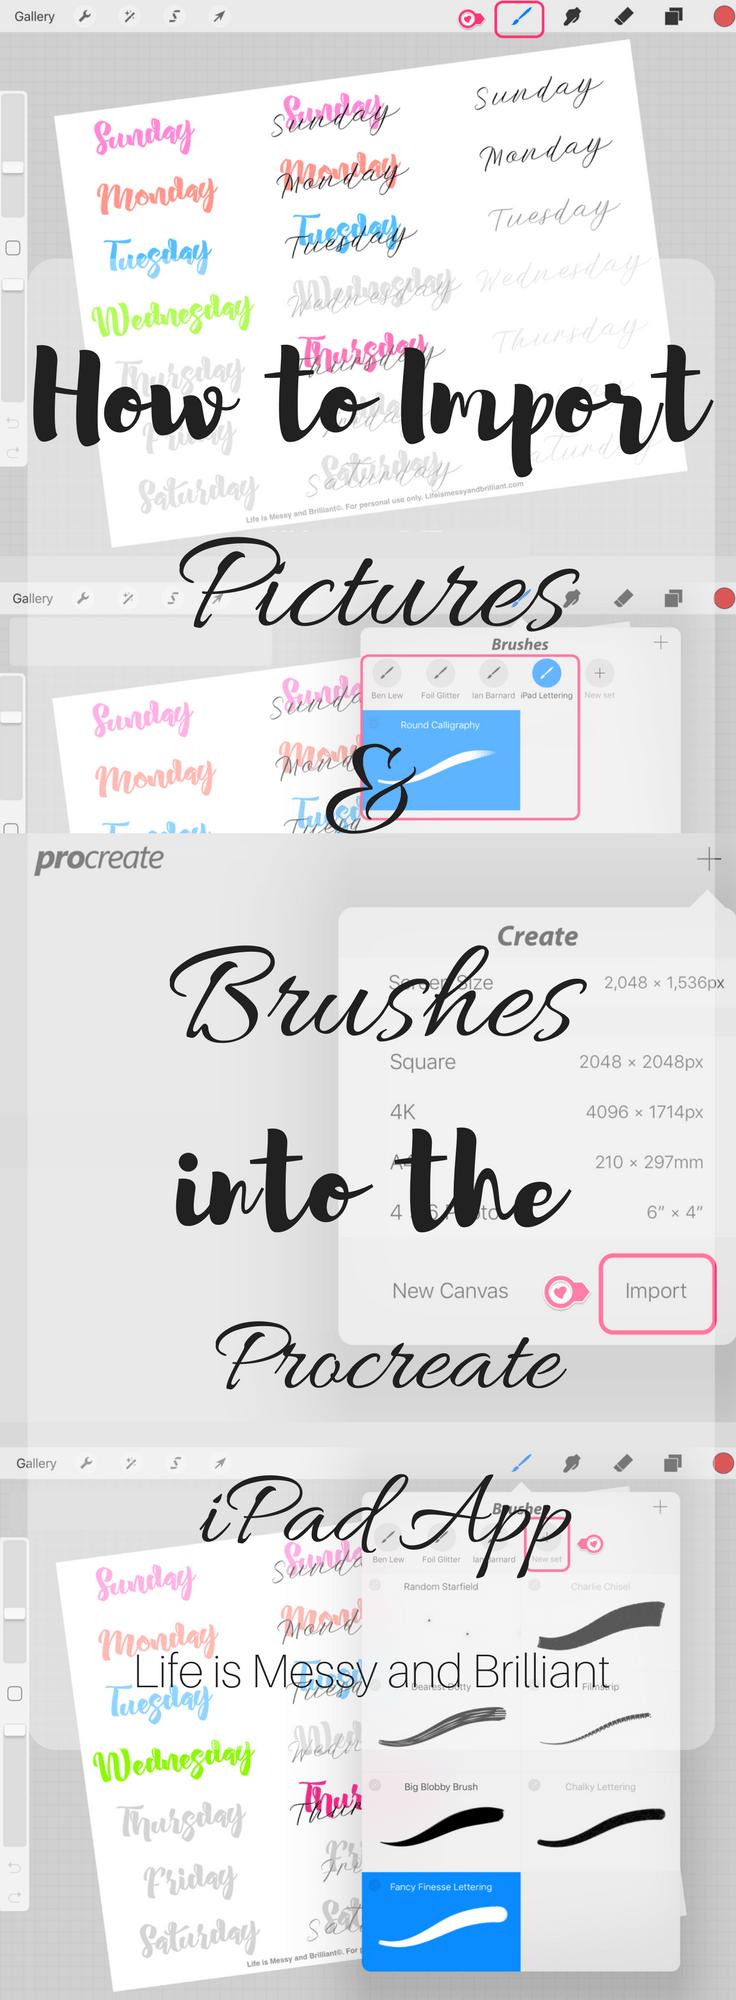 apple ipad tutorial for beginners